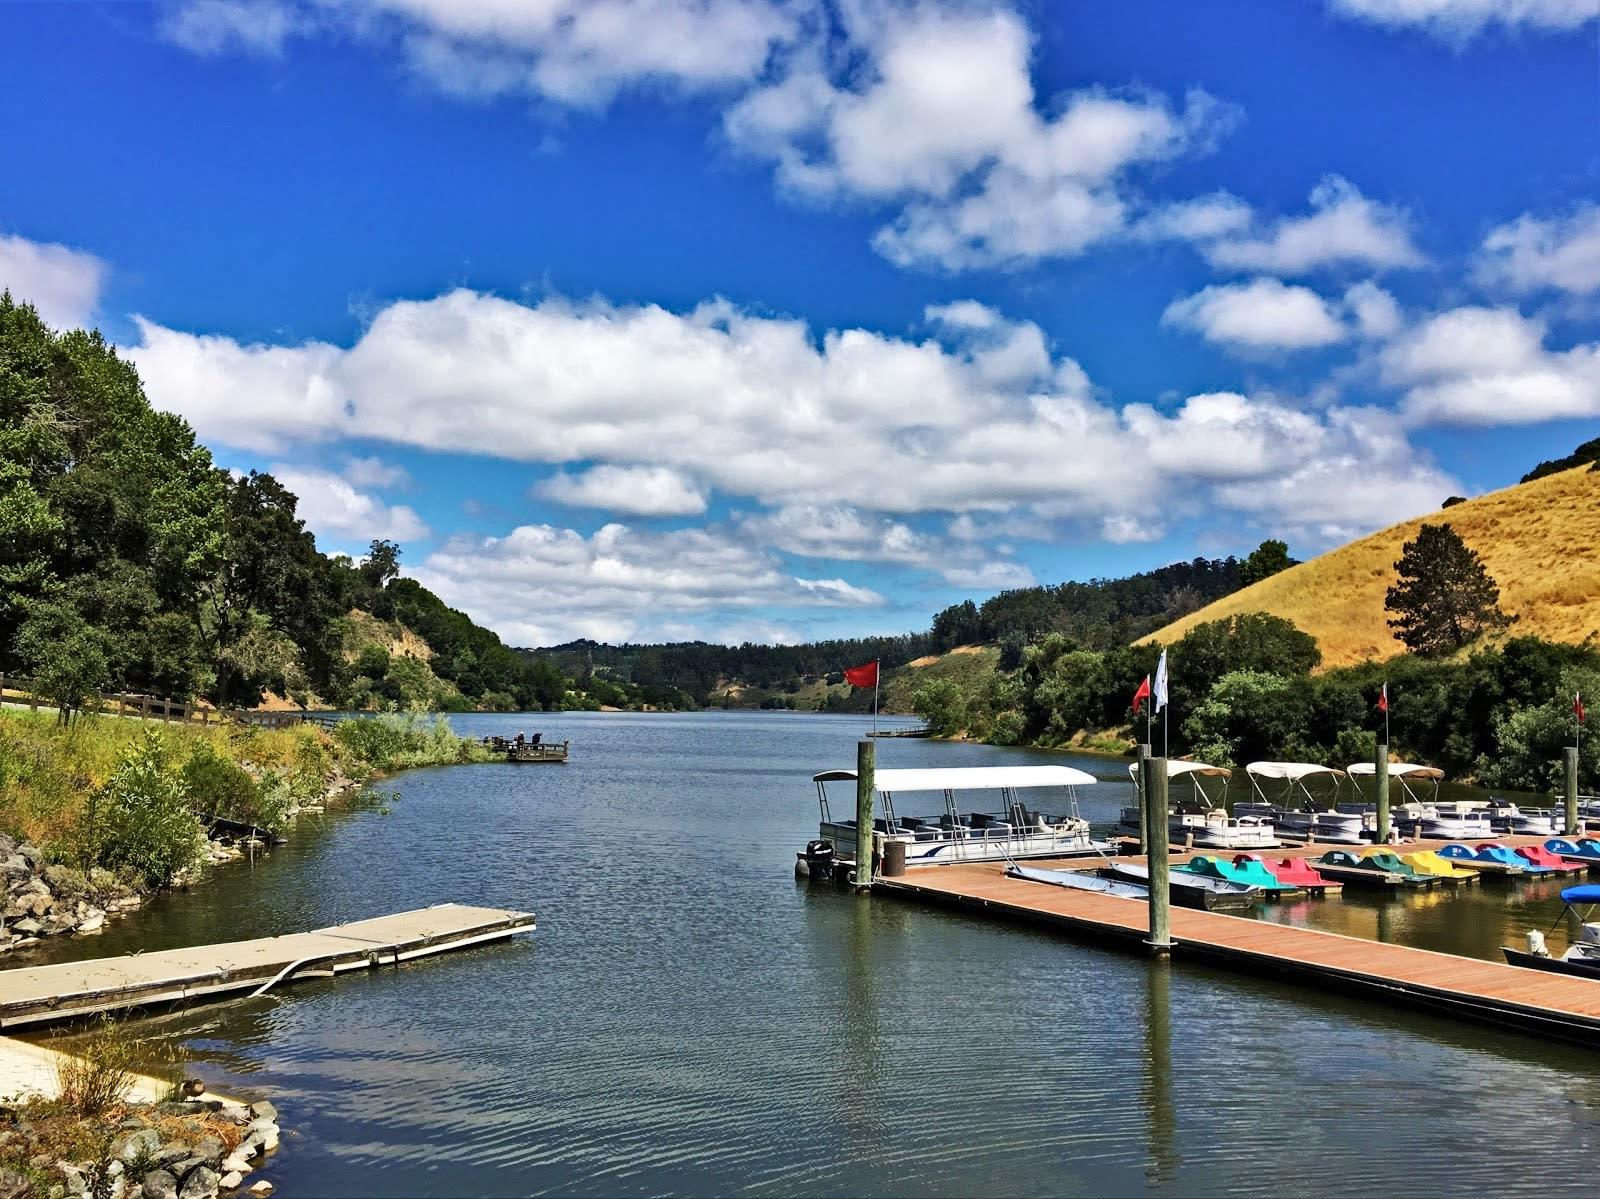 Castro Valley image